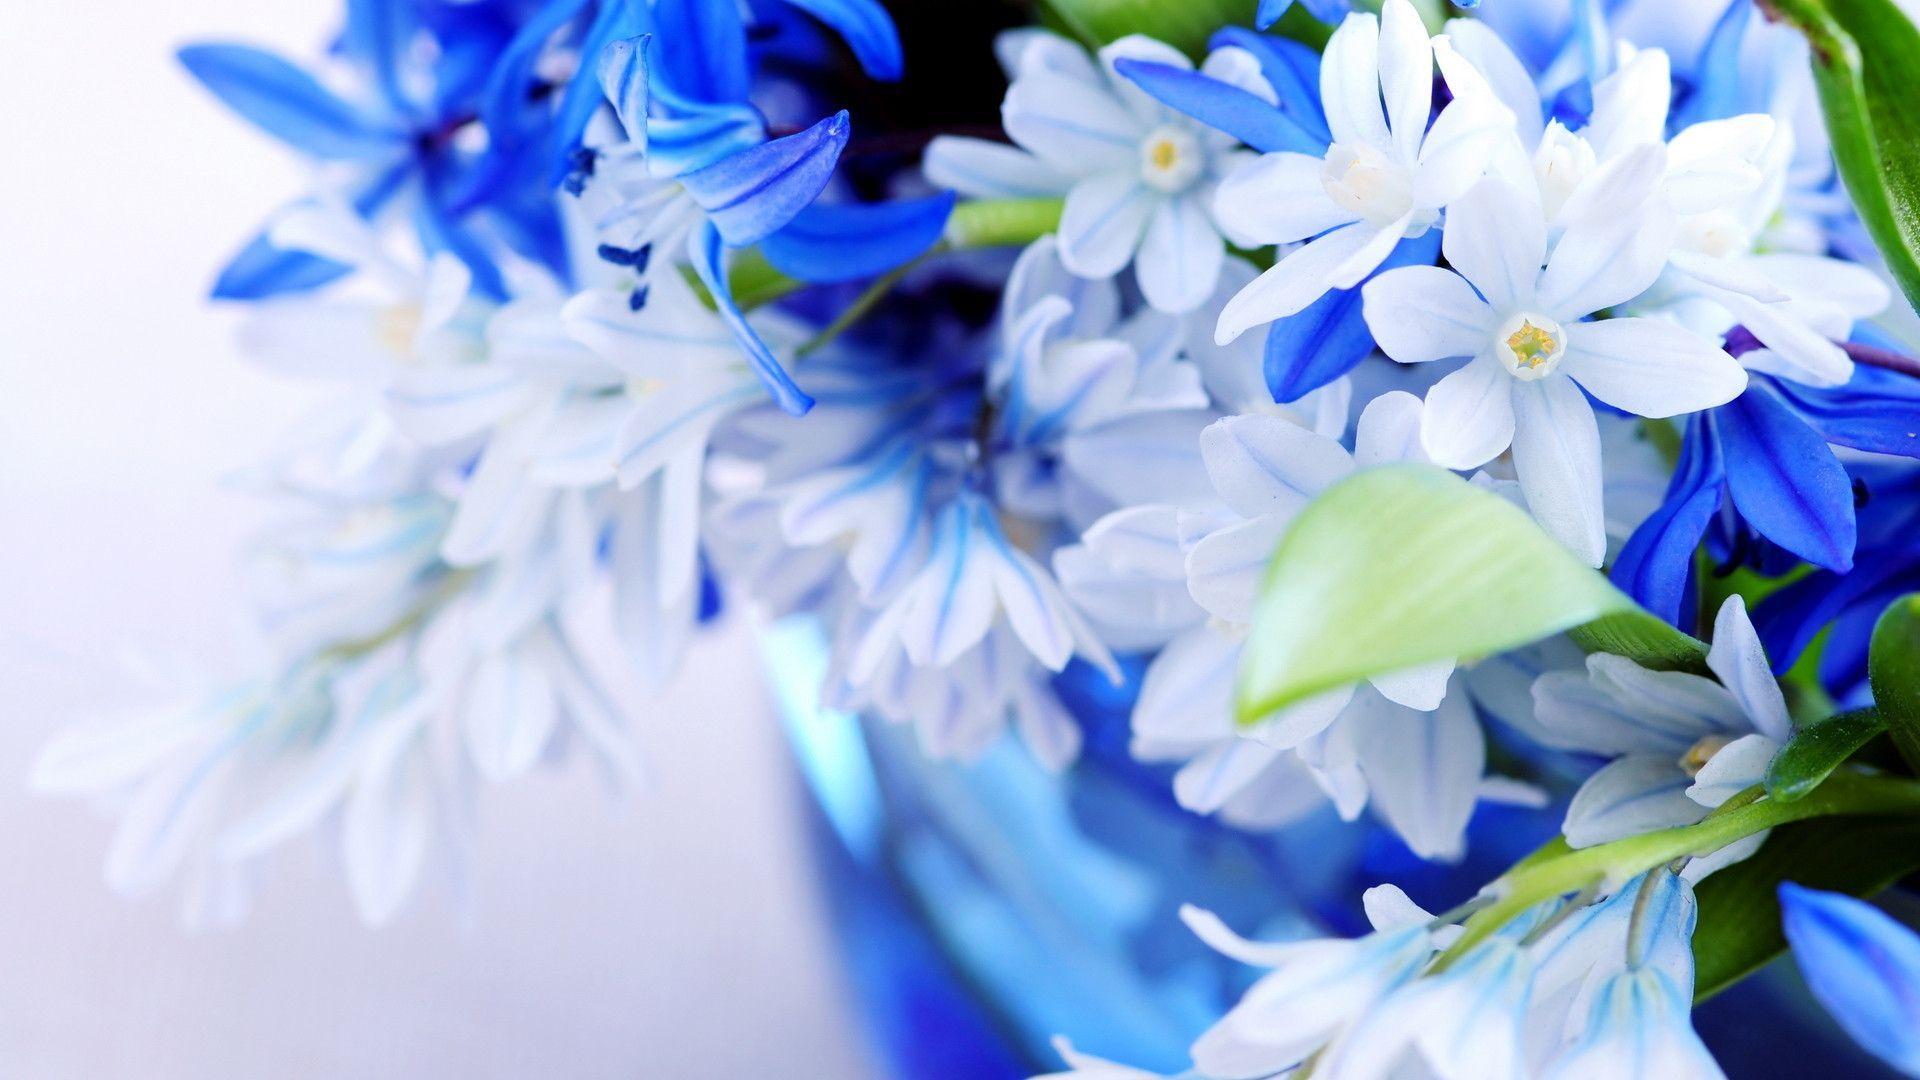 Desktop Wallpaper Hd 3d Full Screen Flowers Blue Flower Wallpaper Wallpaper Nature Flowers Flower Desktop Wallpaper